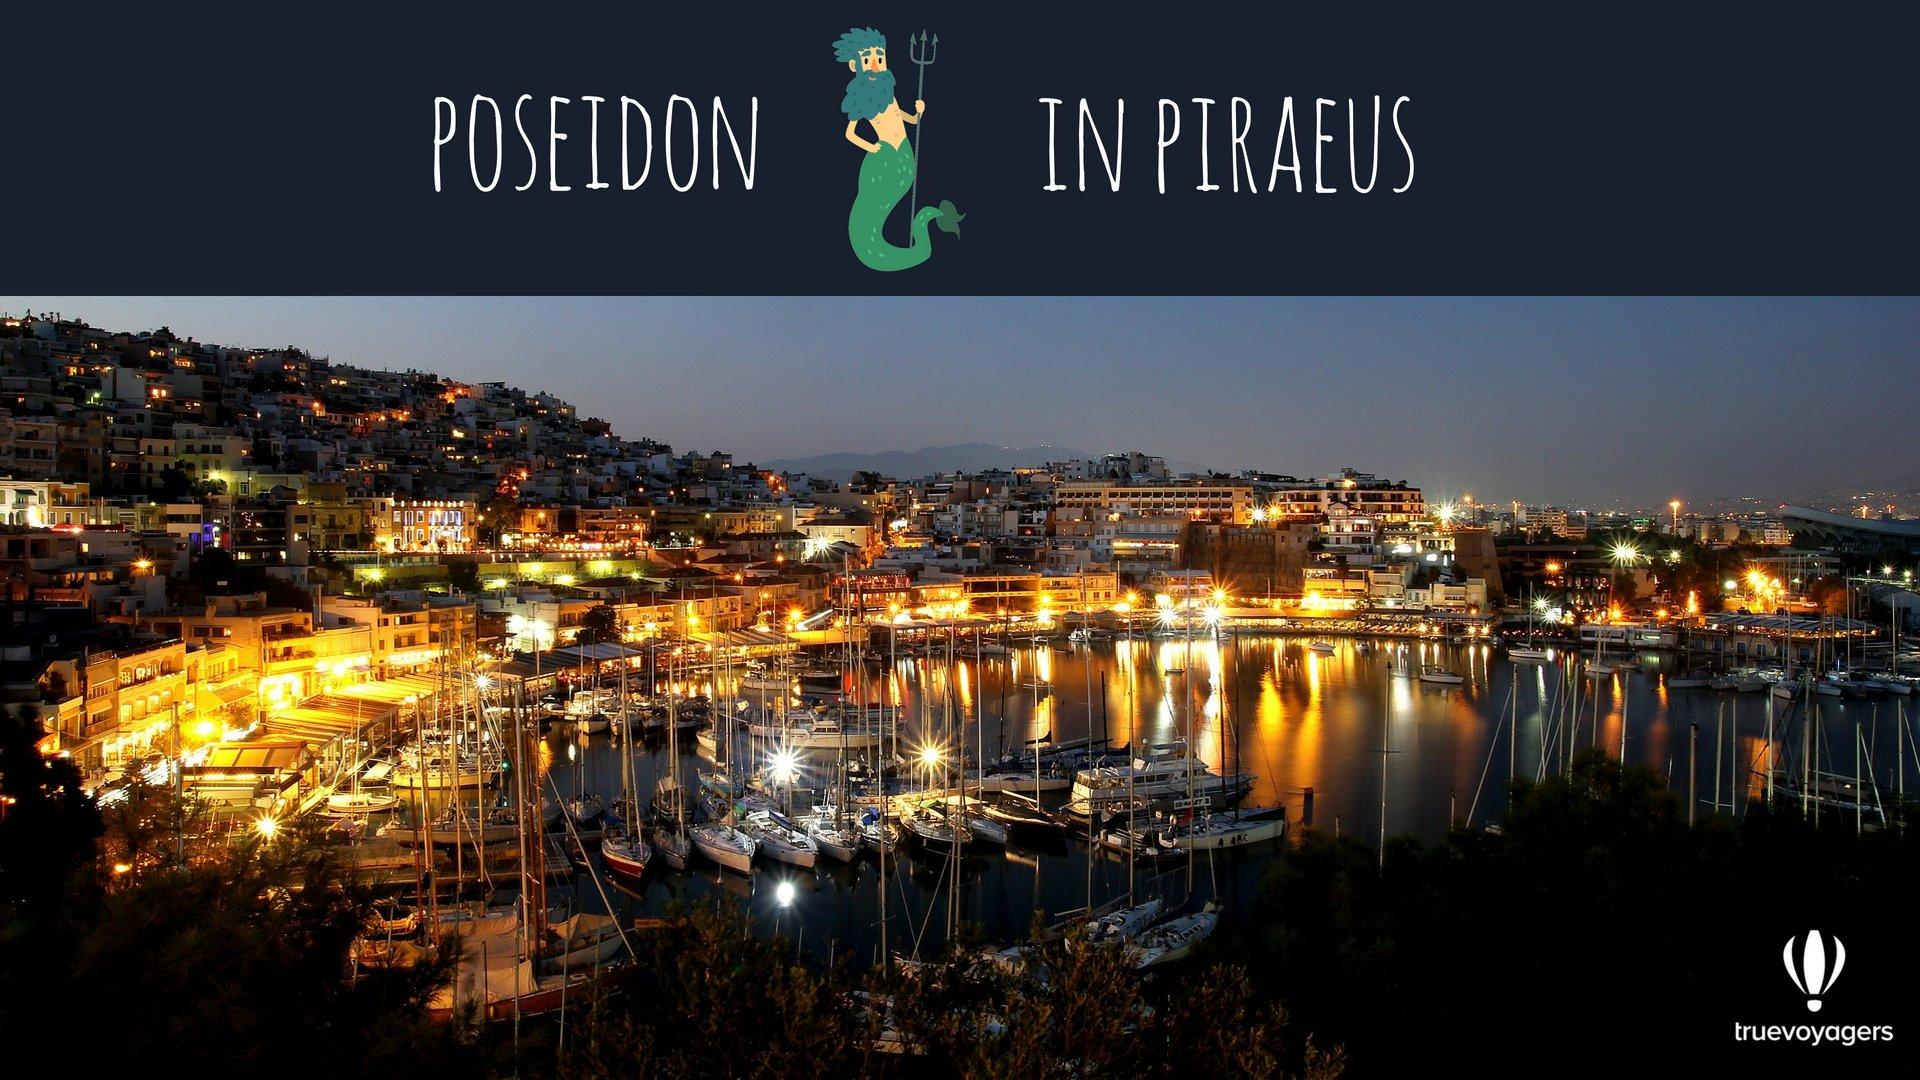 Poseidon in Piraeus. Copyright: Truevoyagers